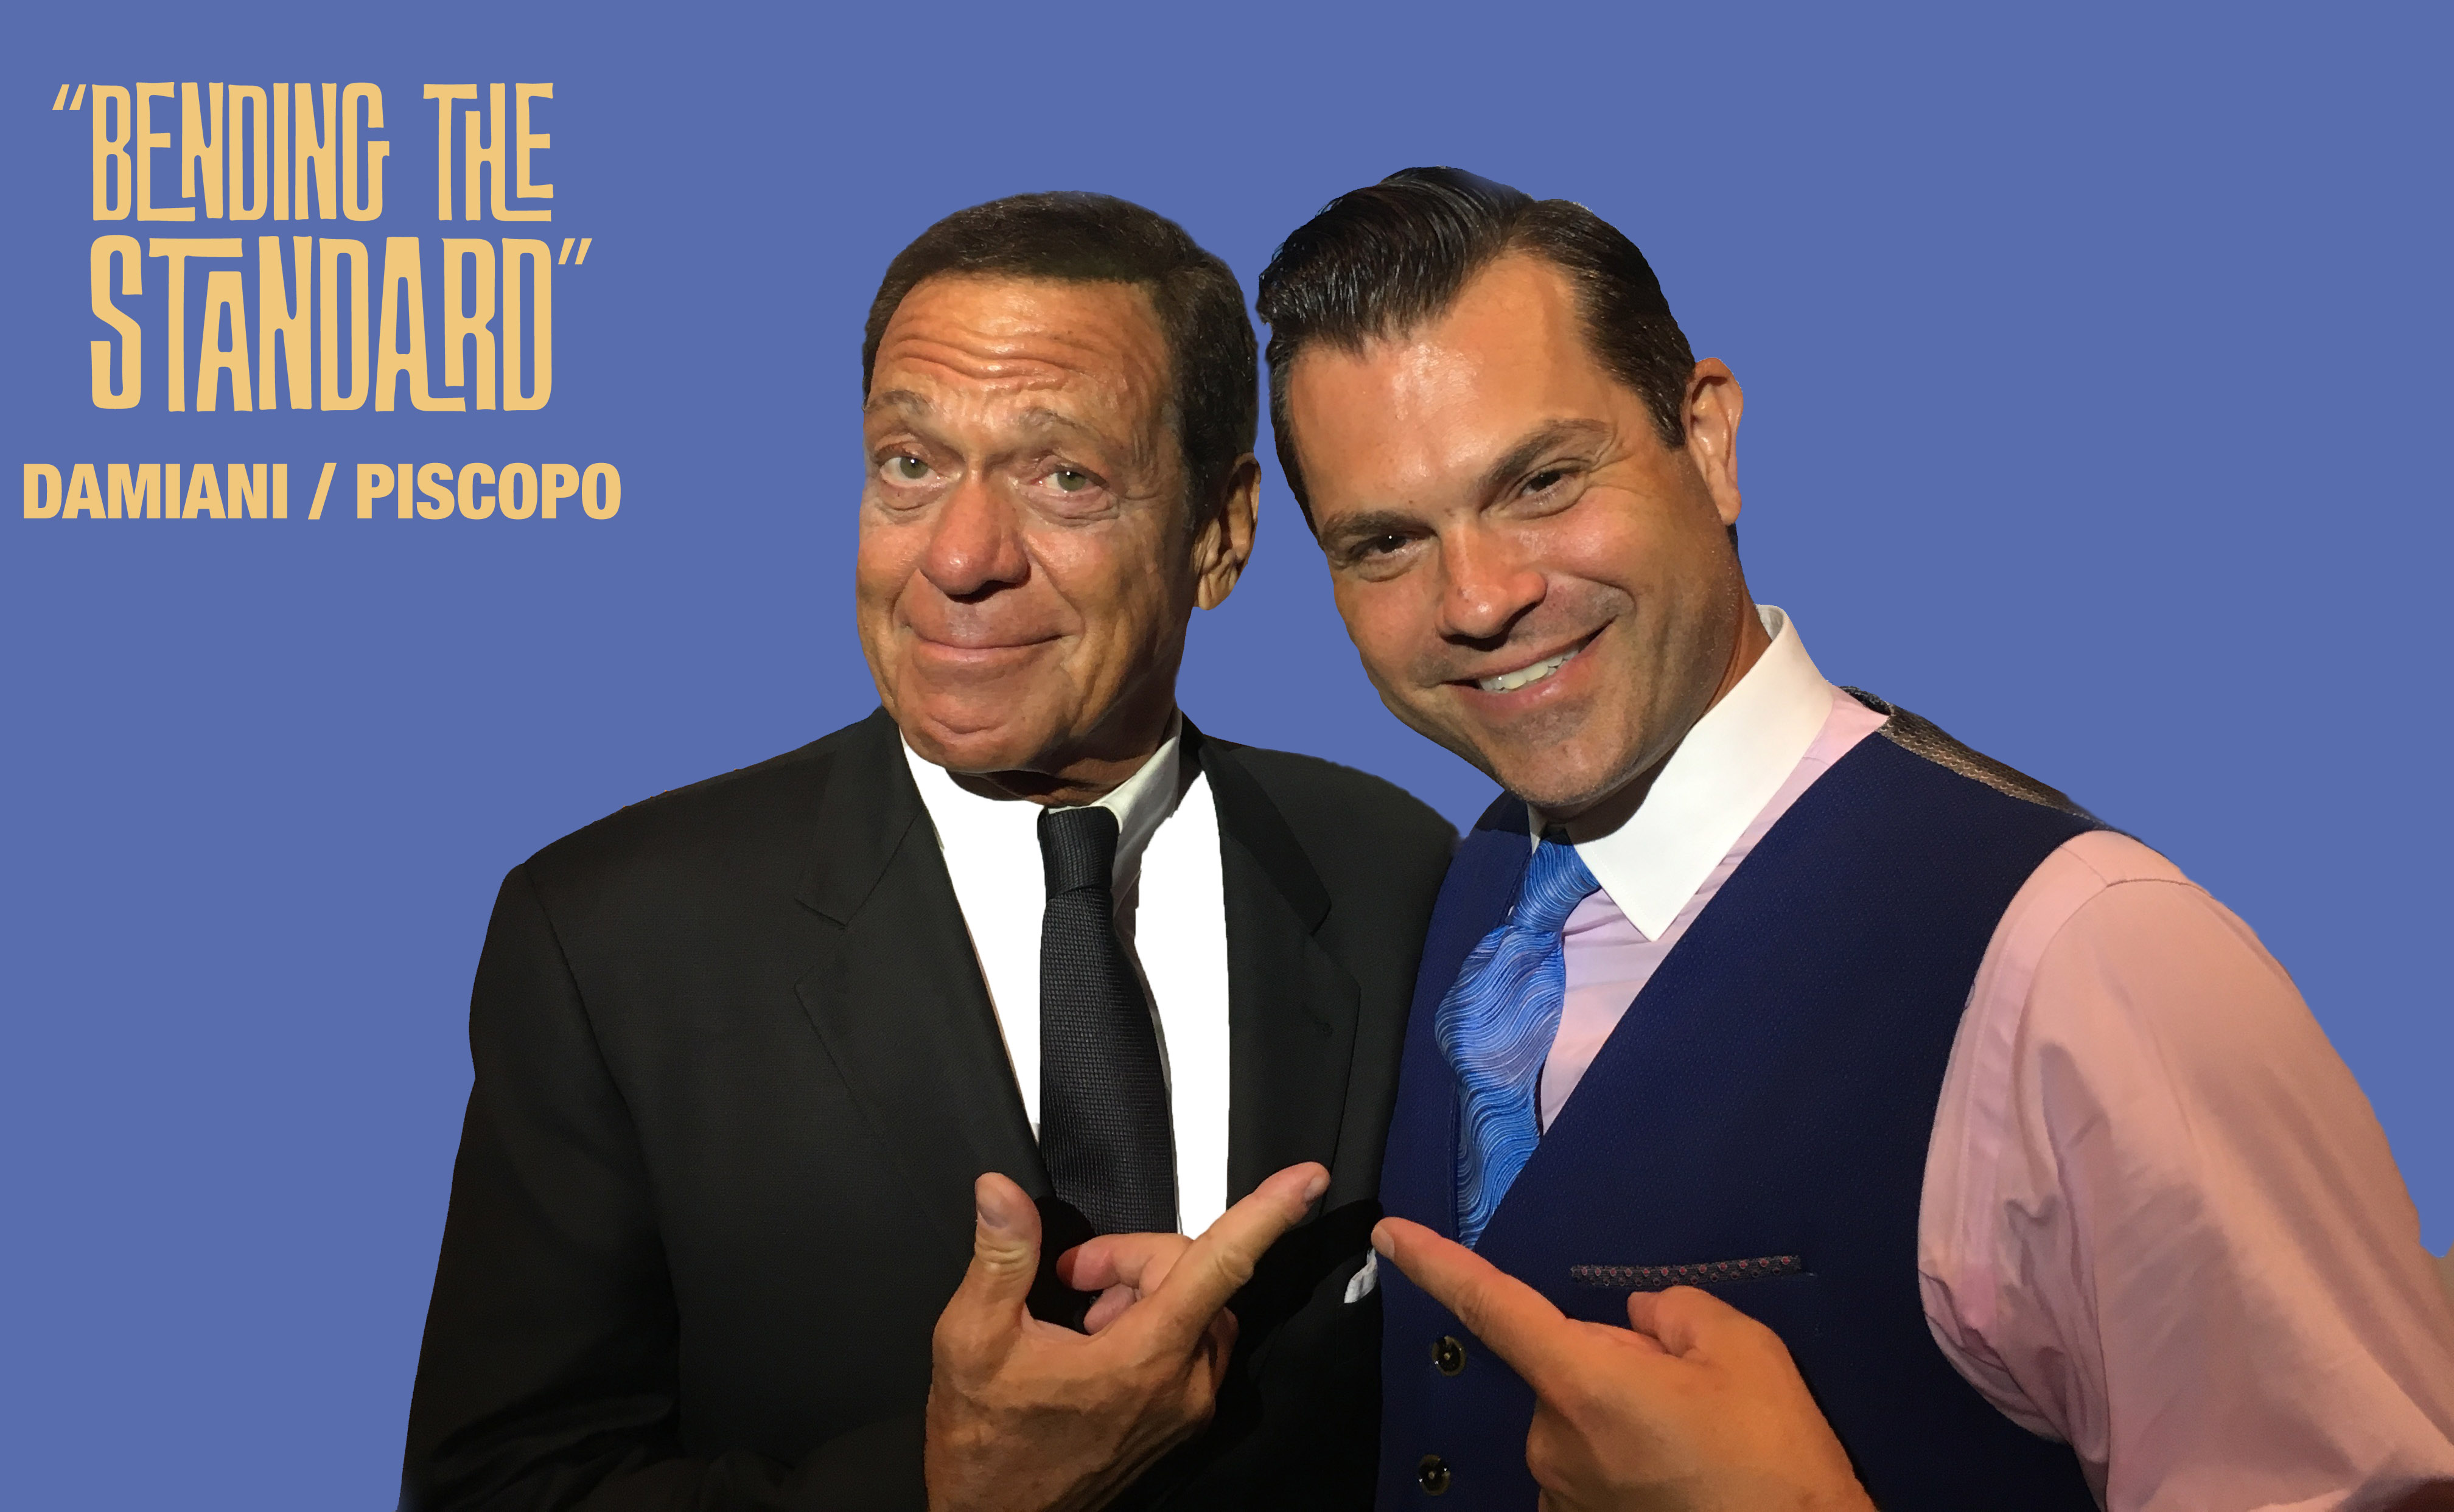 New Orleans, LA - Waldorf Astoria - JOE PISCOPO, DAVE DAMIANI & RENEE OLSTEAD - GREAT AMERICAN SPEAKEASY